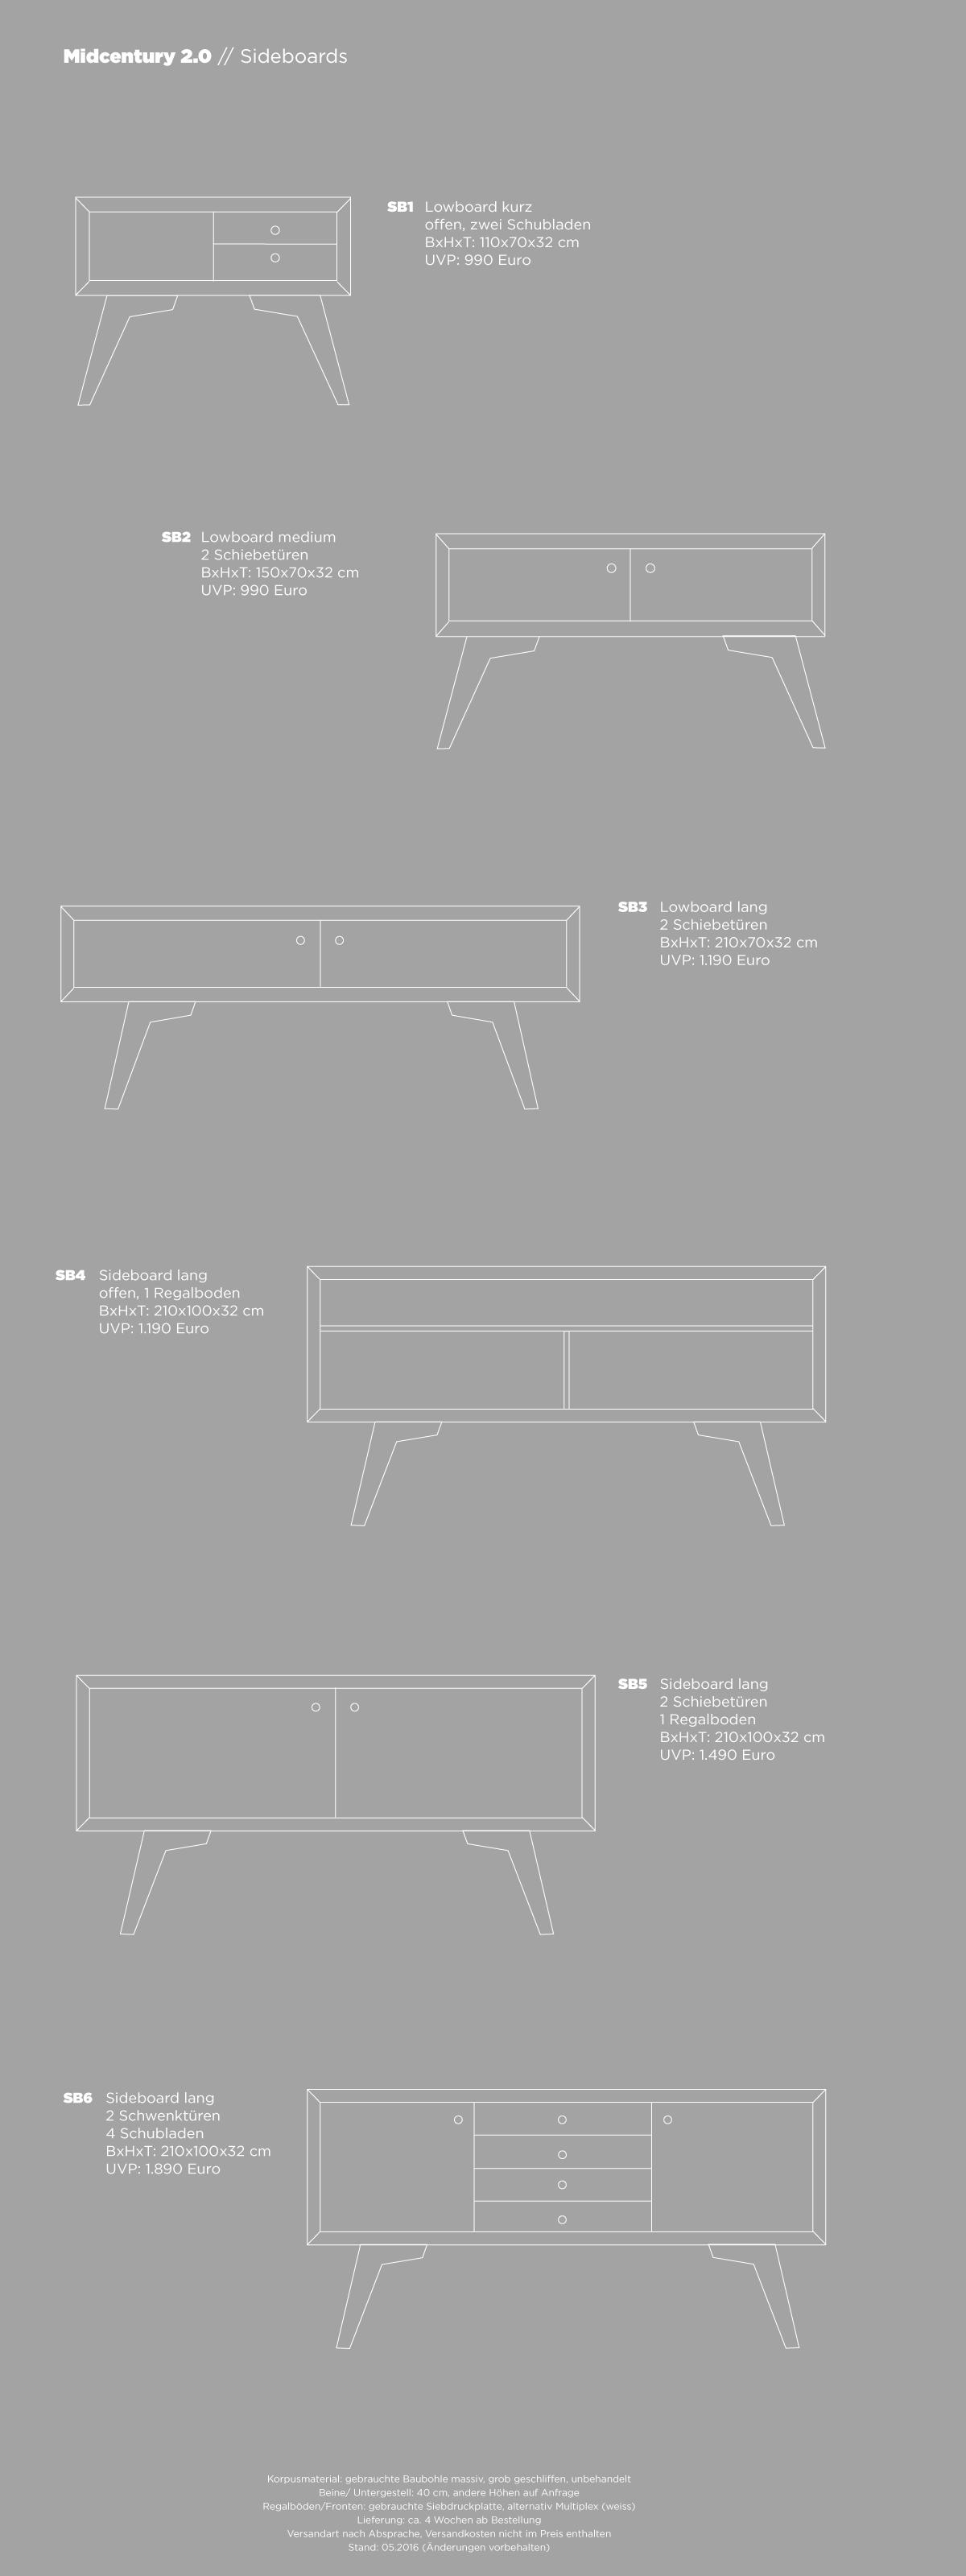 midcentury-sideboards